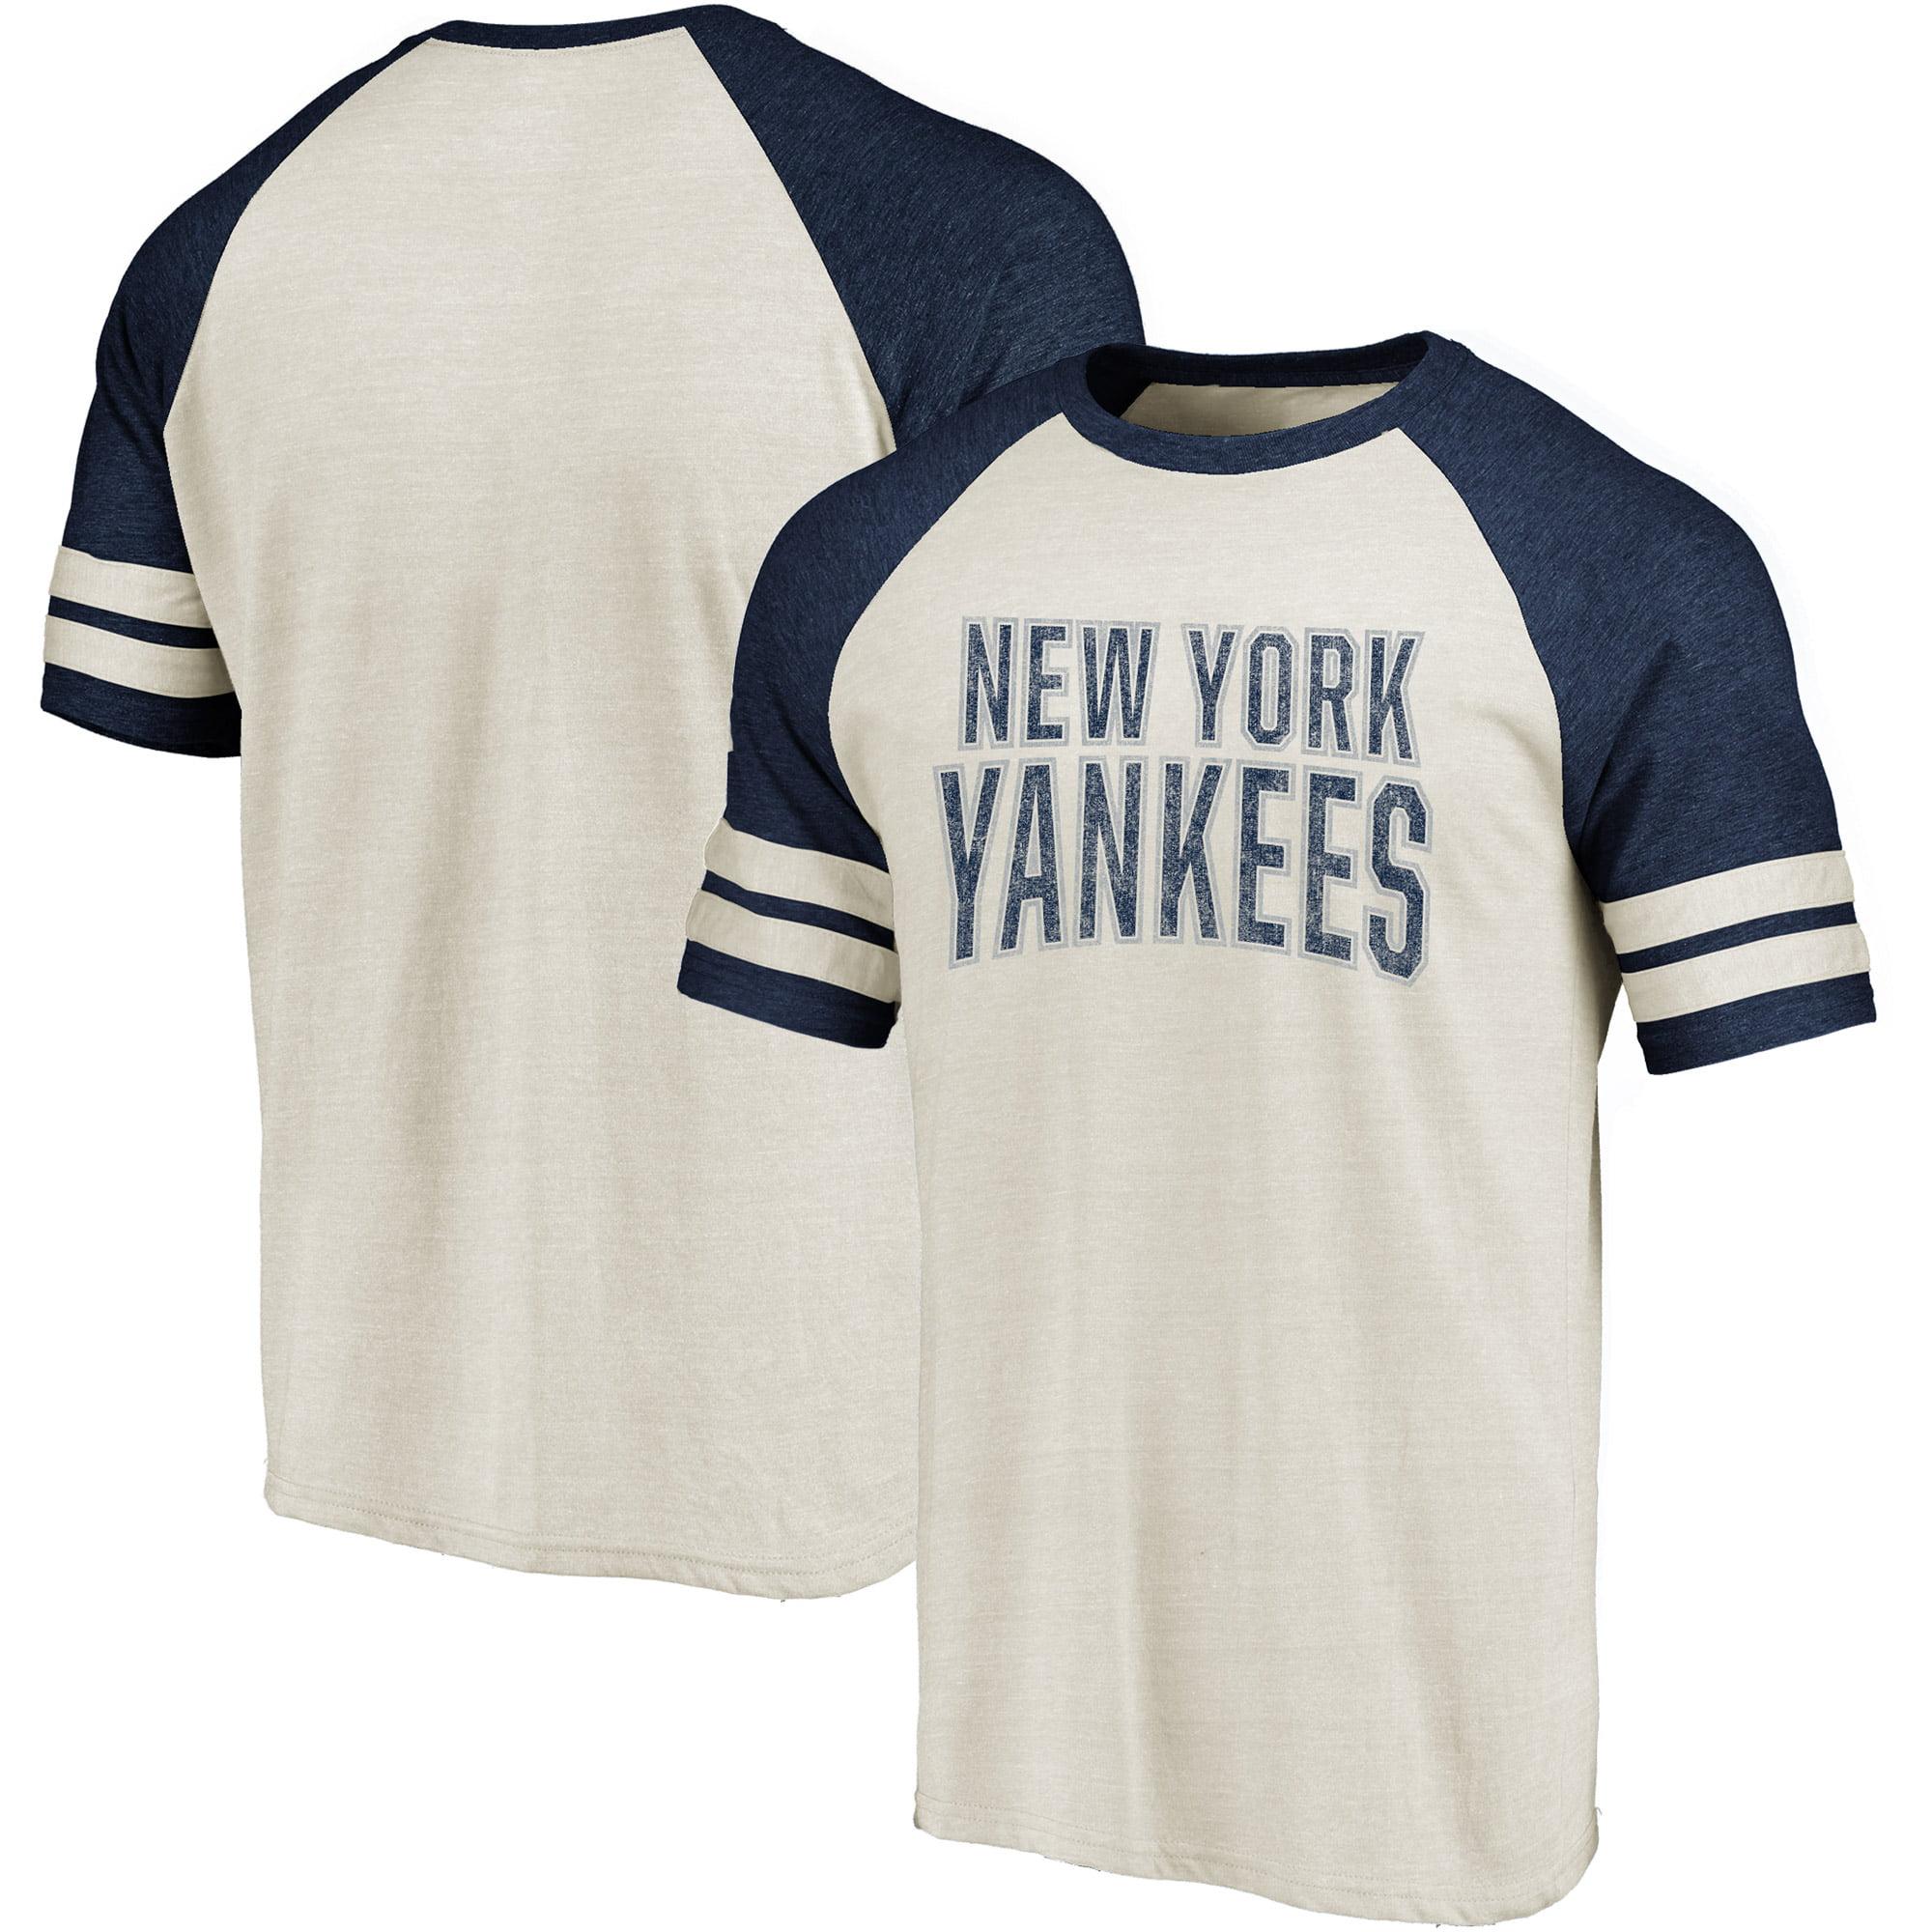 Men's Fanatics Branded Cream/Navy New York Yankees True Classics Colorblock Raglan T-Shirt